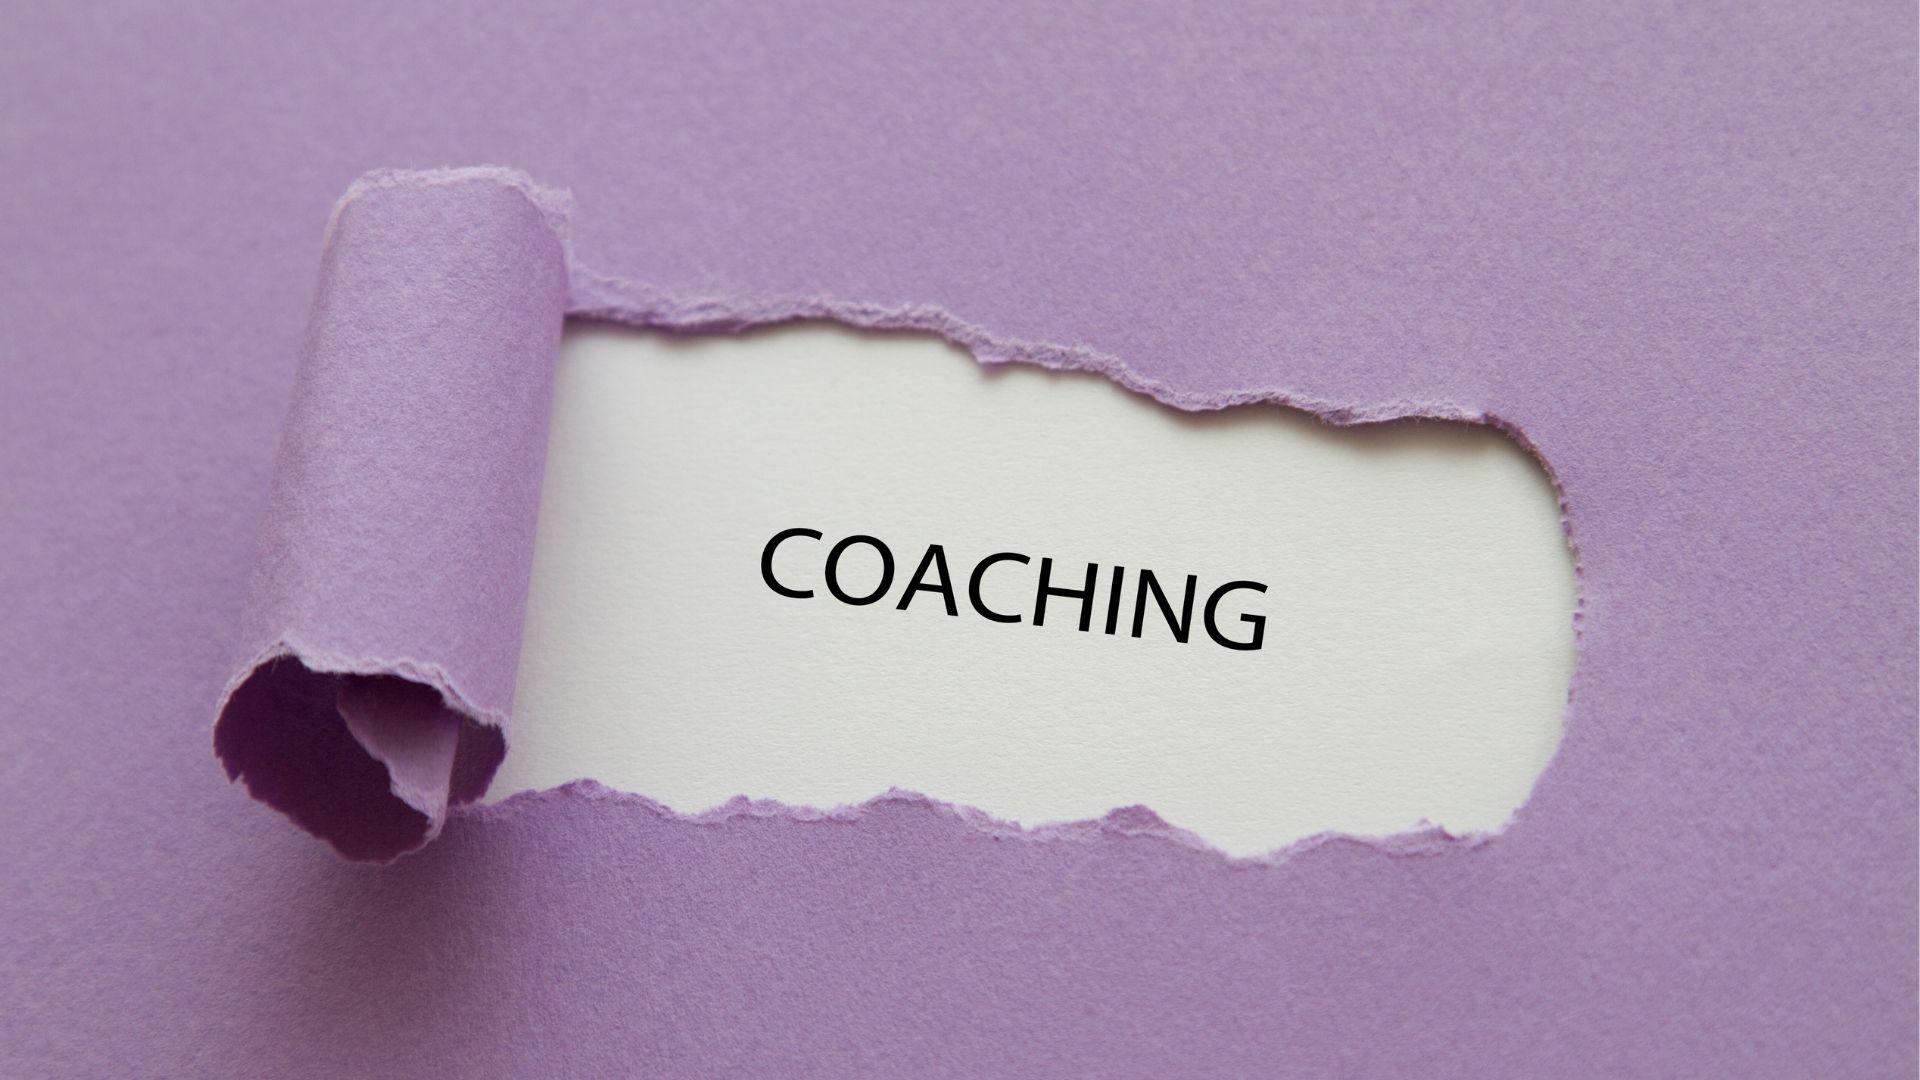 ISAT coaching center in Chandigarh